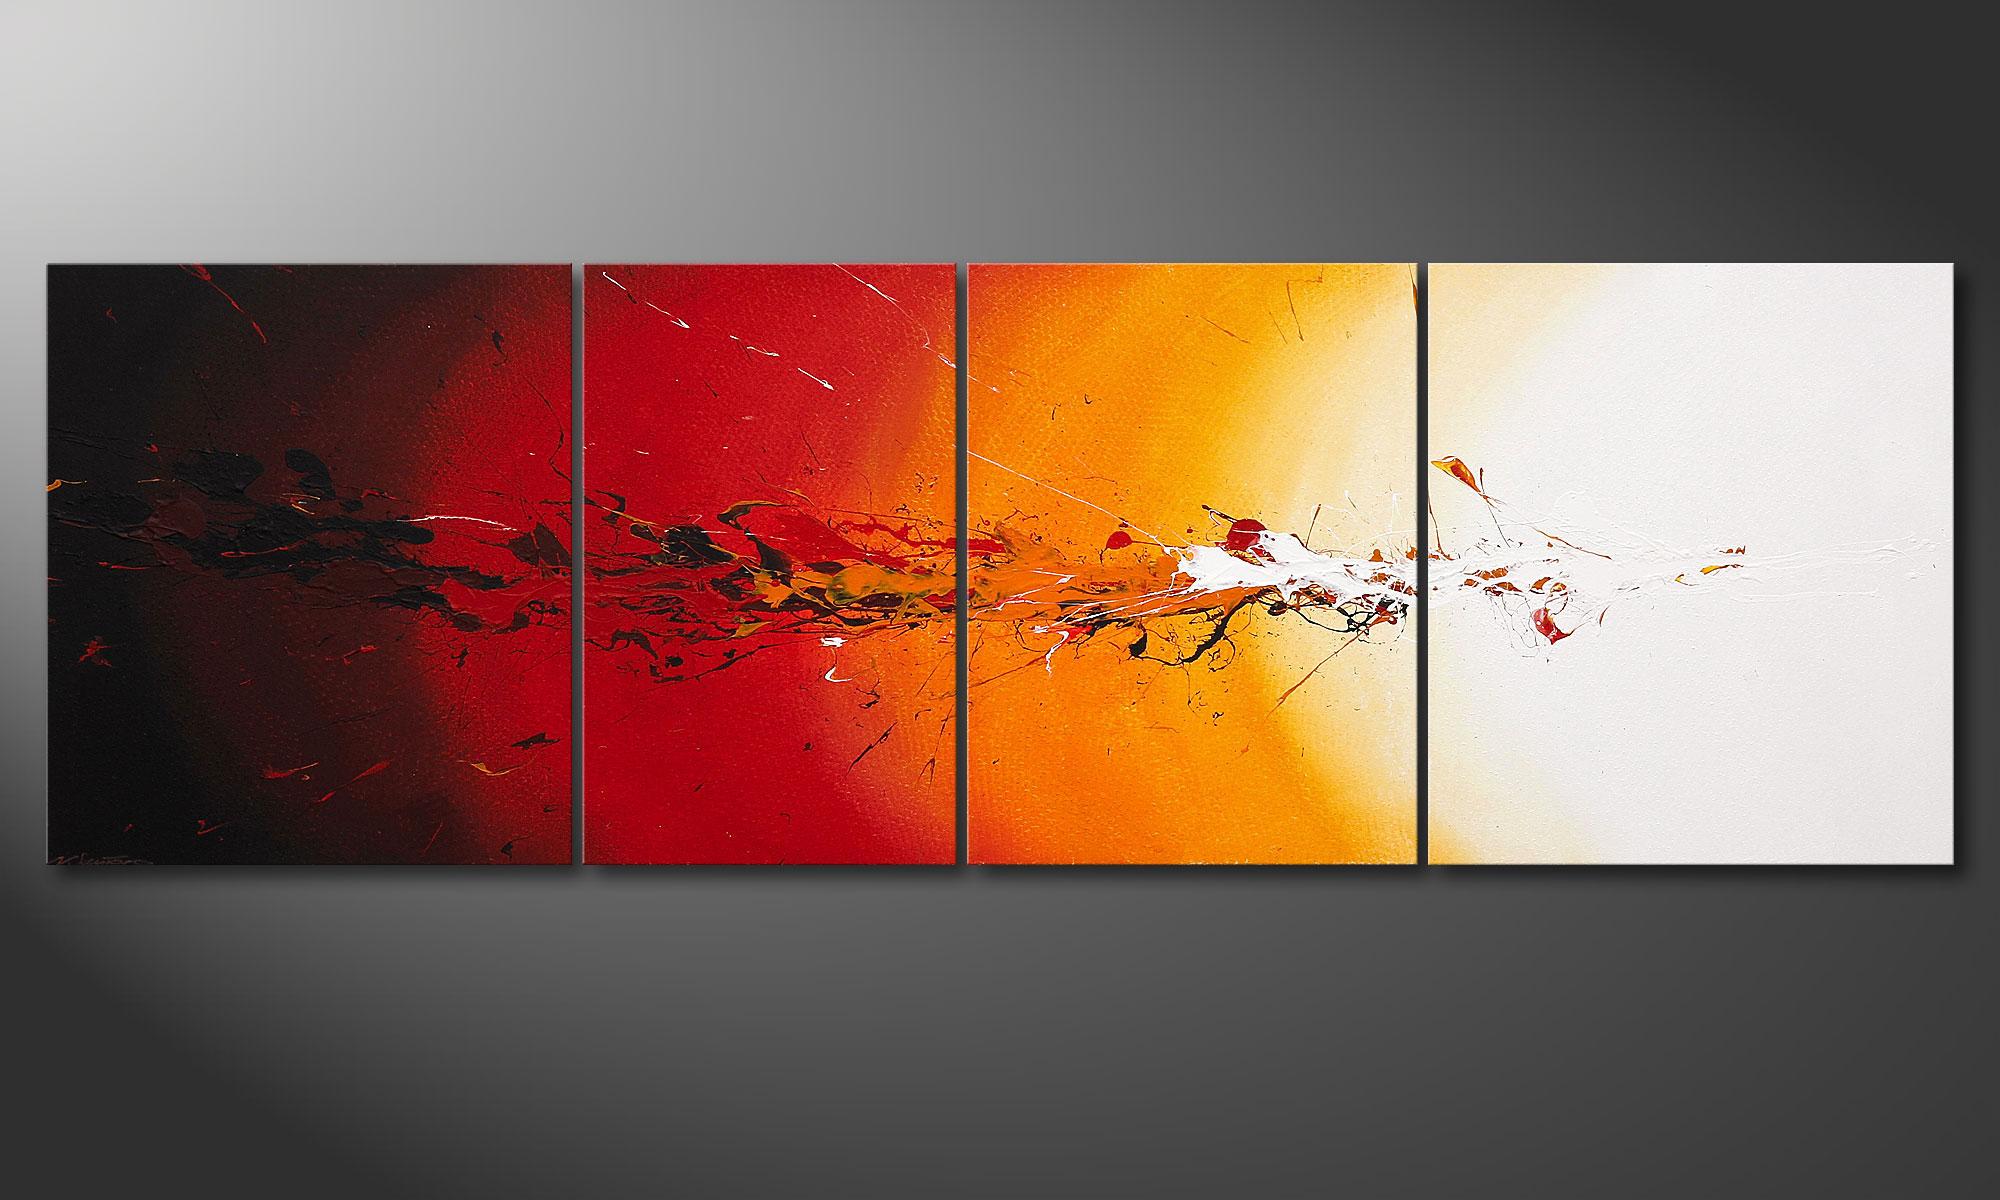 la toile xxl peinte la main fiery splash 250x80cm. Black Bedroom Furniture Sets. Home Design Ideas